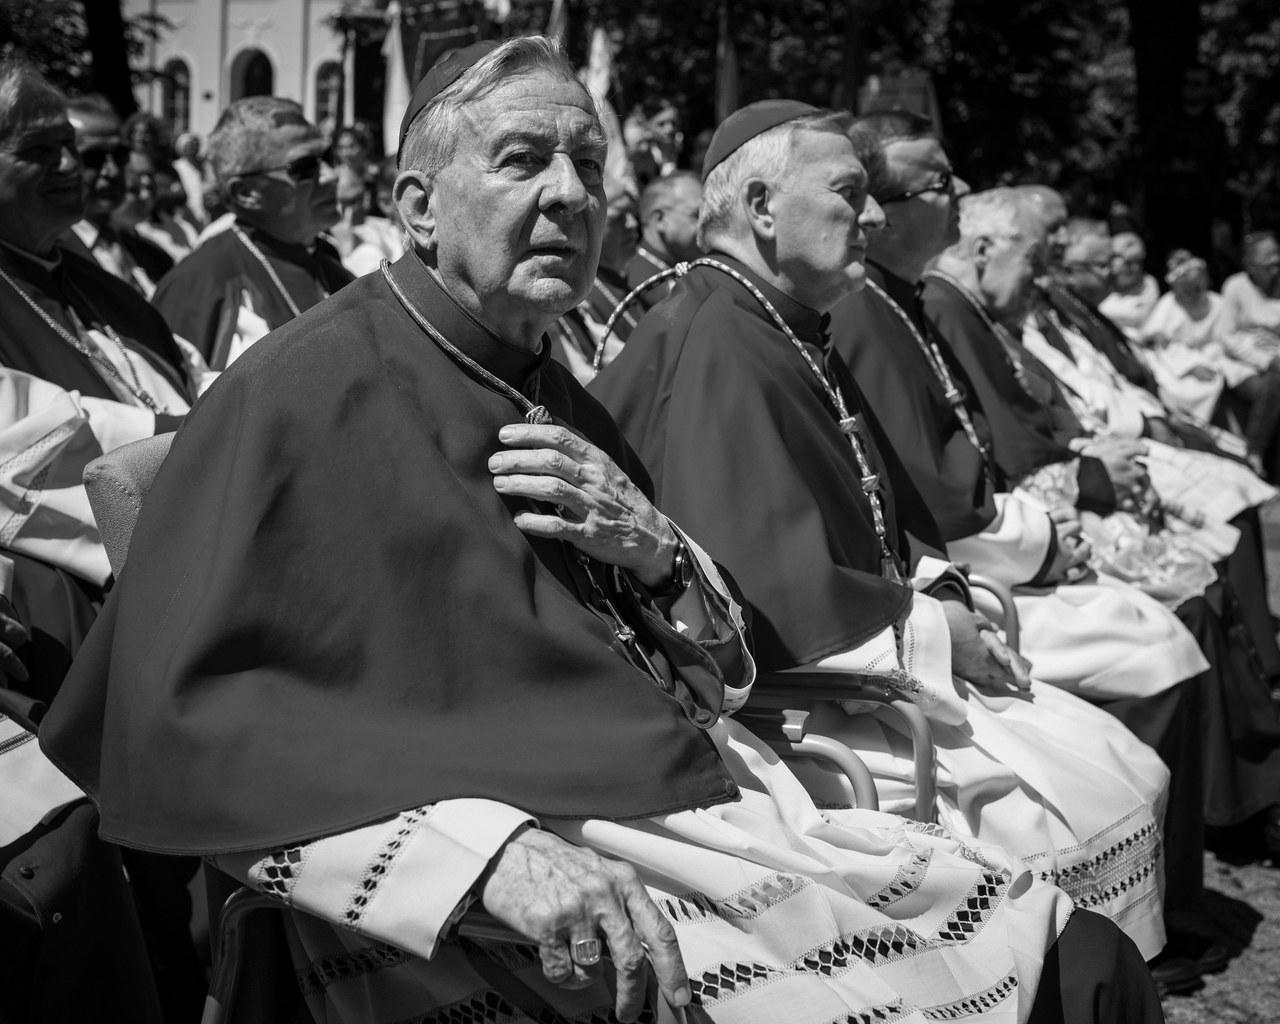 Abp senior Juliusz Paetz nie żyje. Miał 84 lata